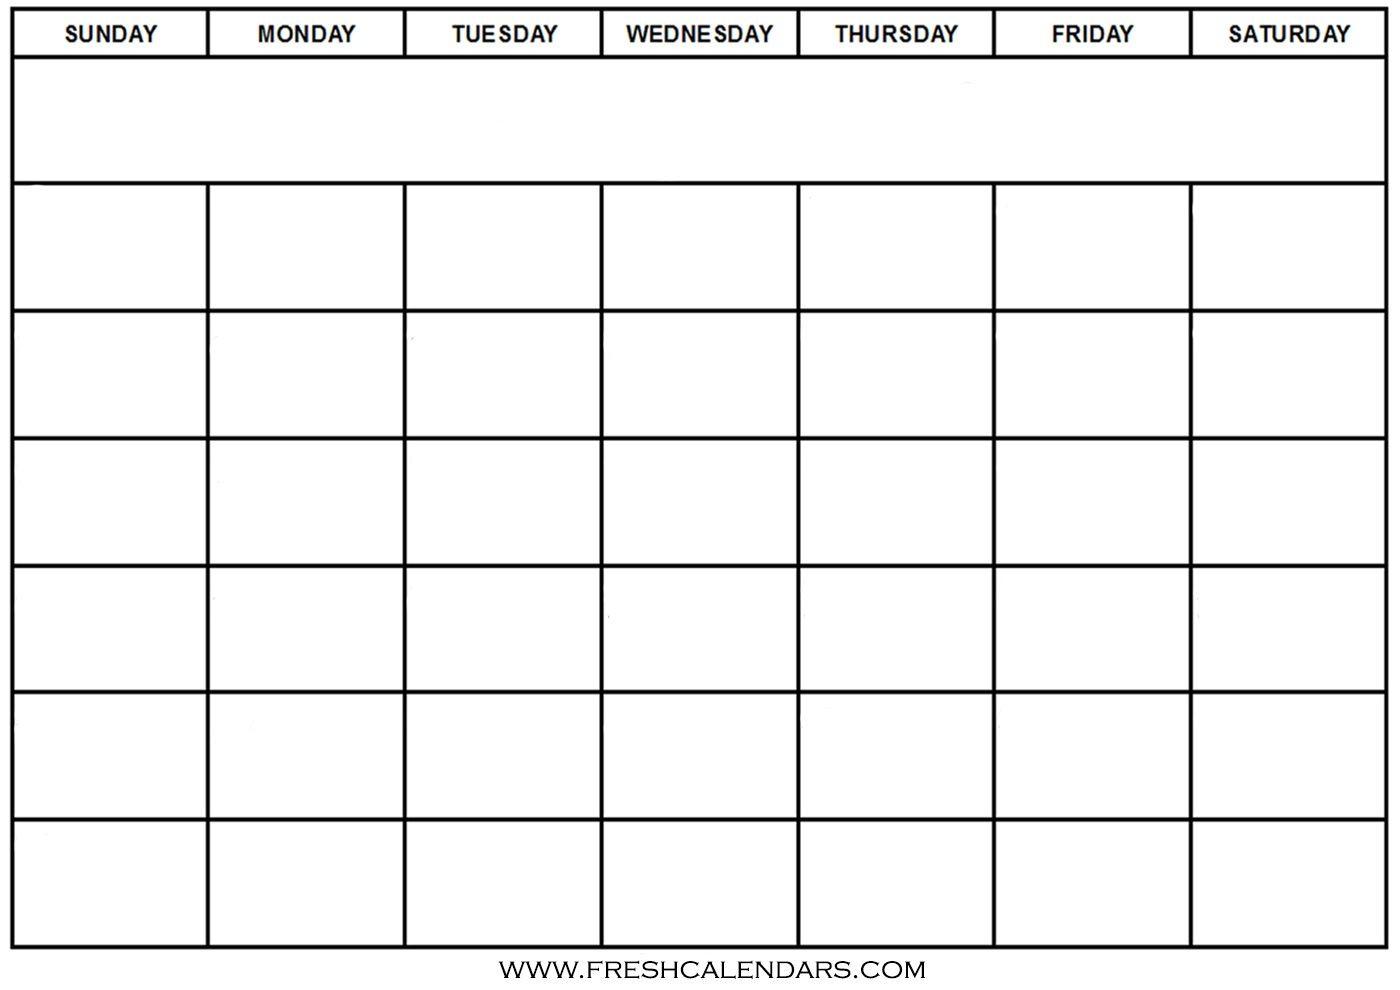 Calendar Template Free Printable Blank Calendar Wonderfully for Free Blank Calendar Templates To Print